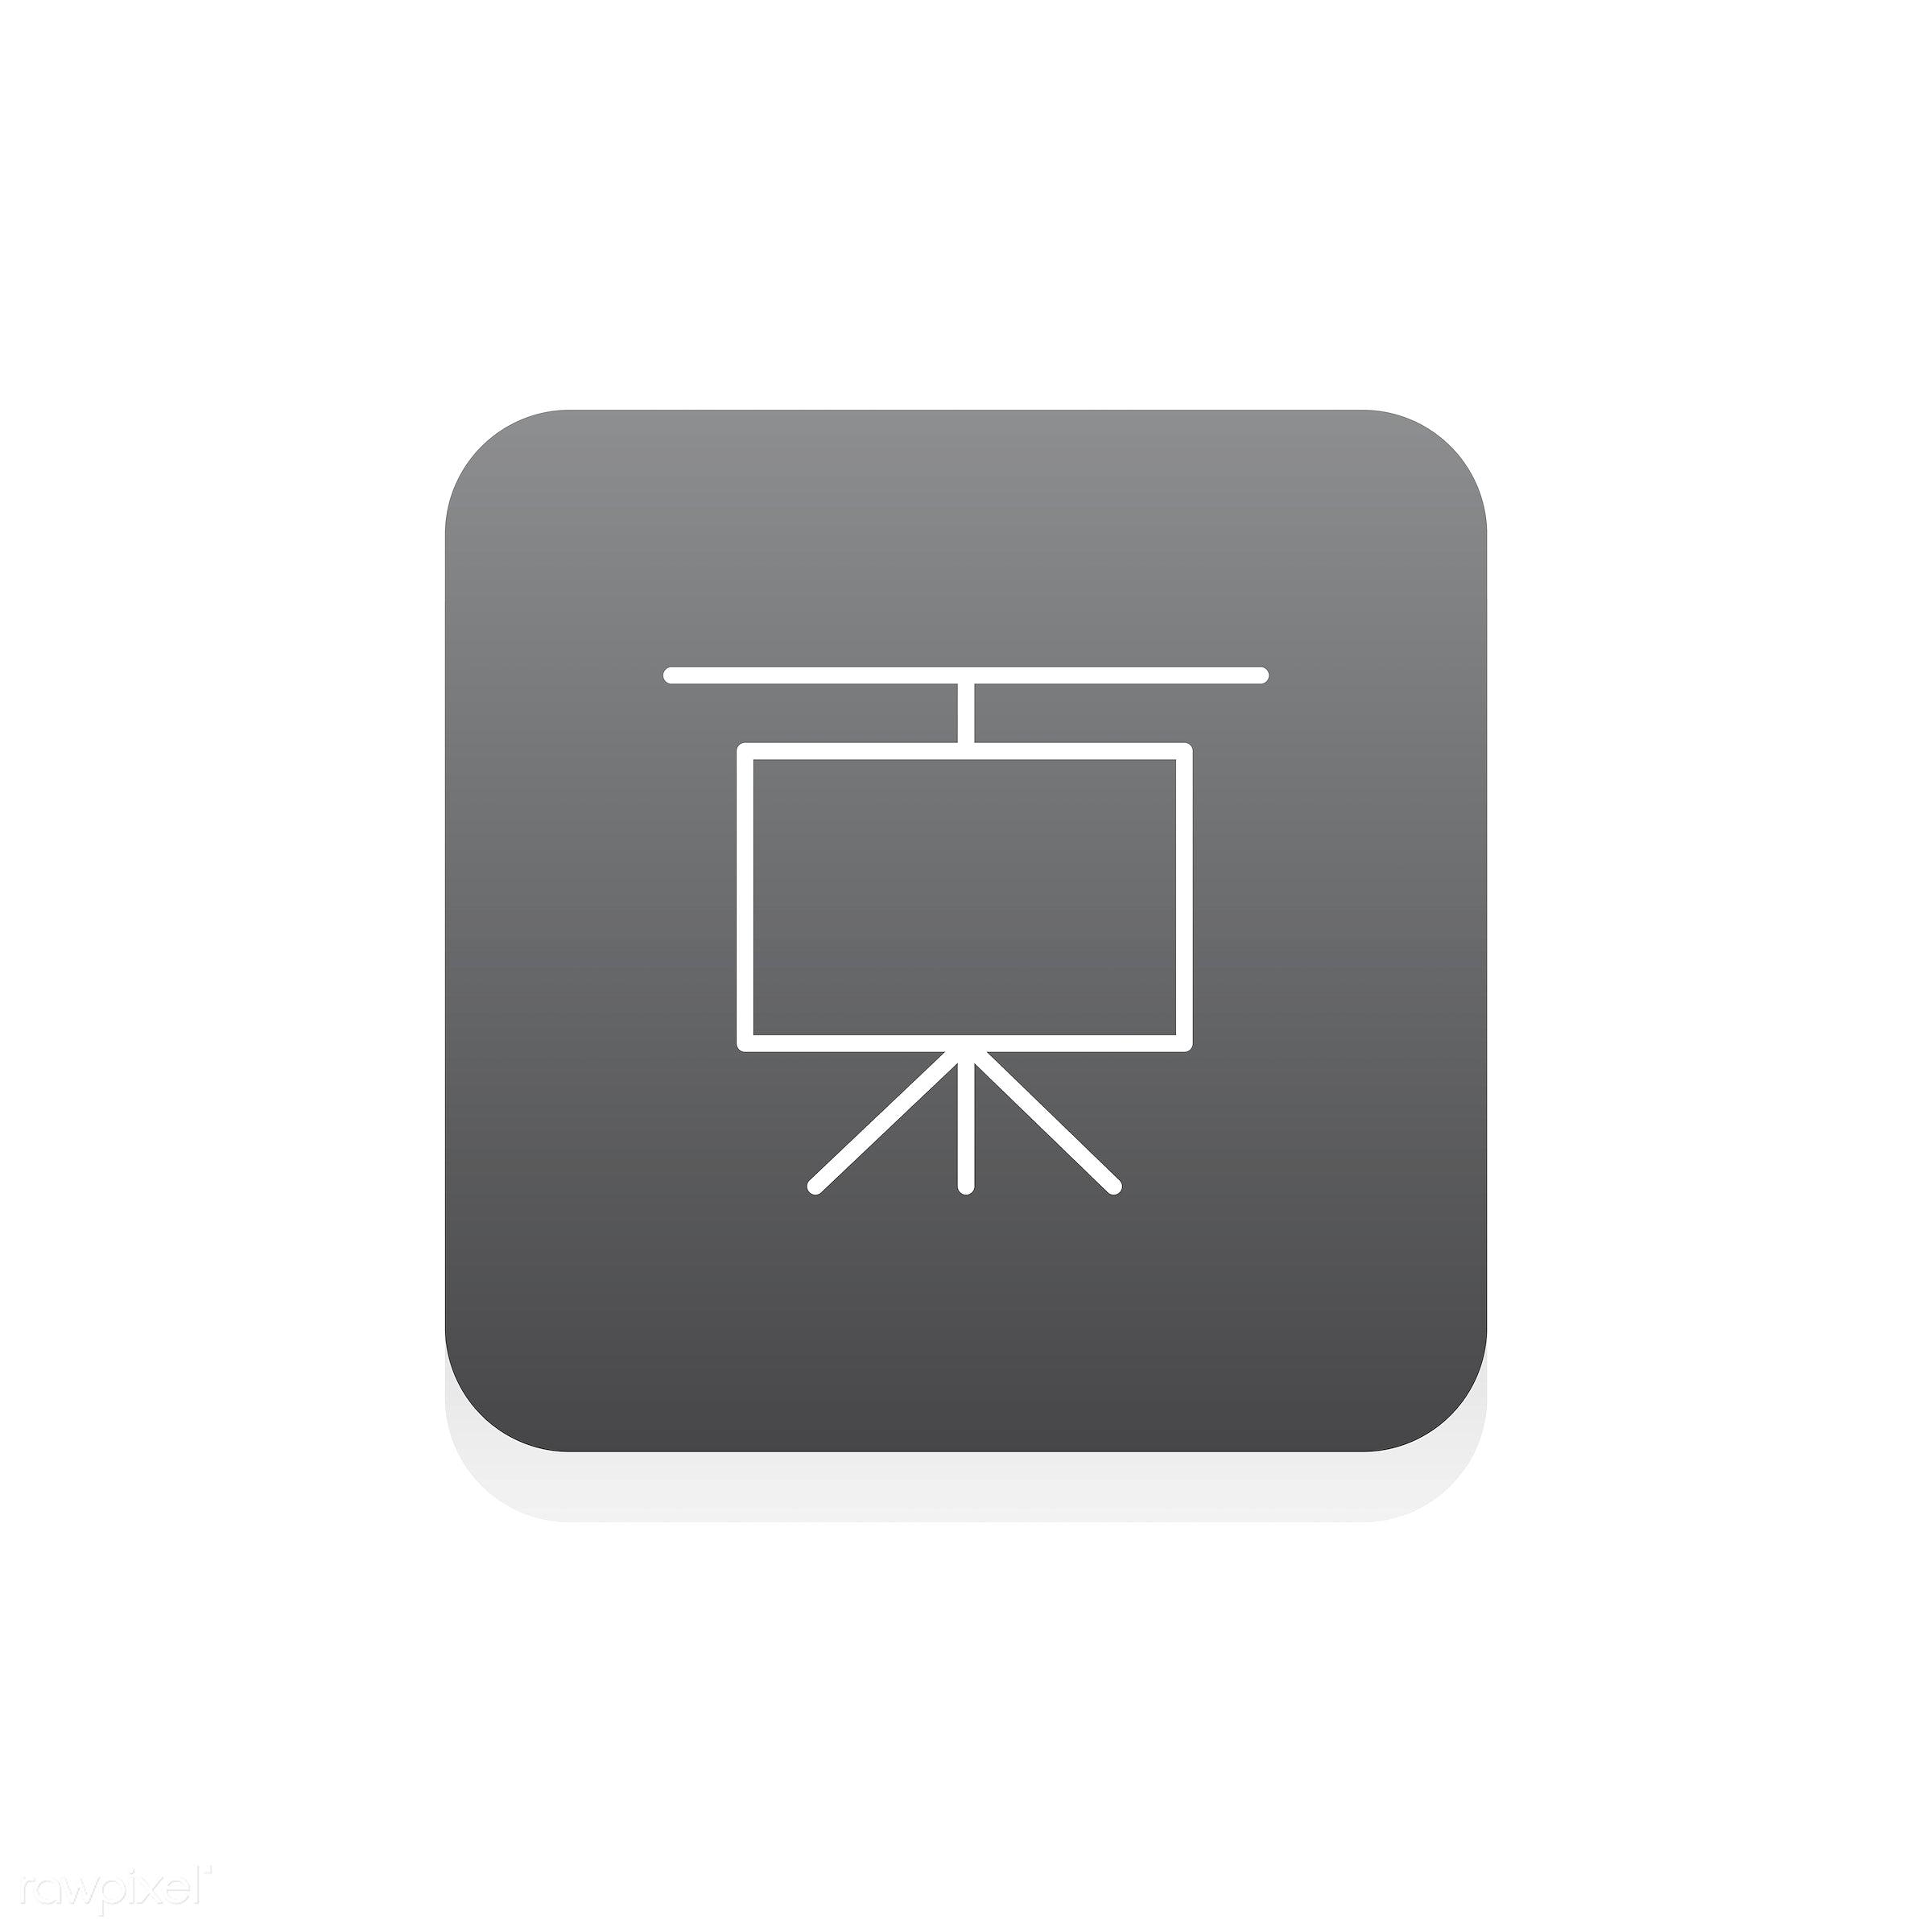 Vector of presentation board - analysis, board, business, chart, data, design, flat, graphic, icon, illustration,...